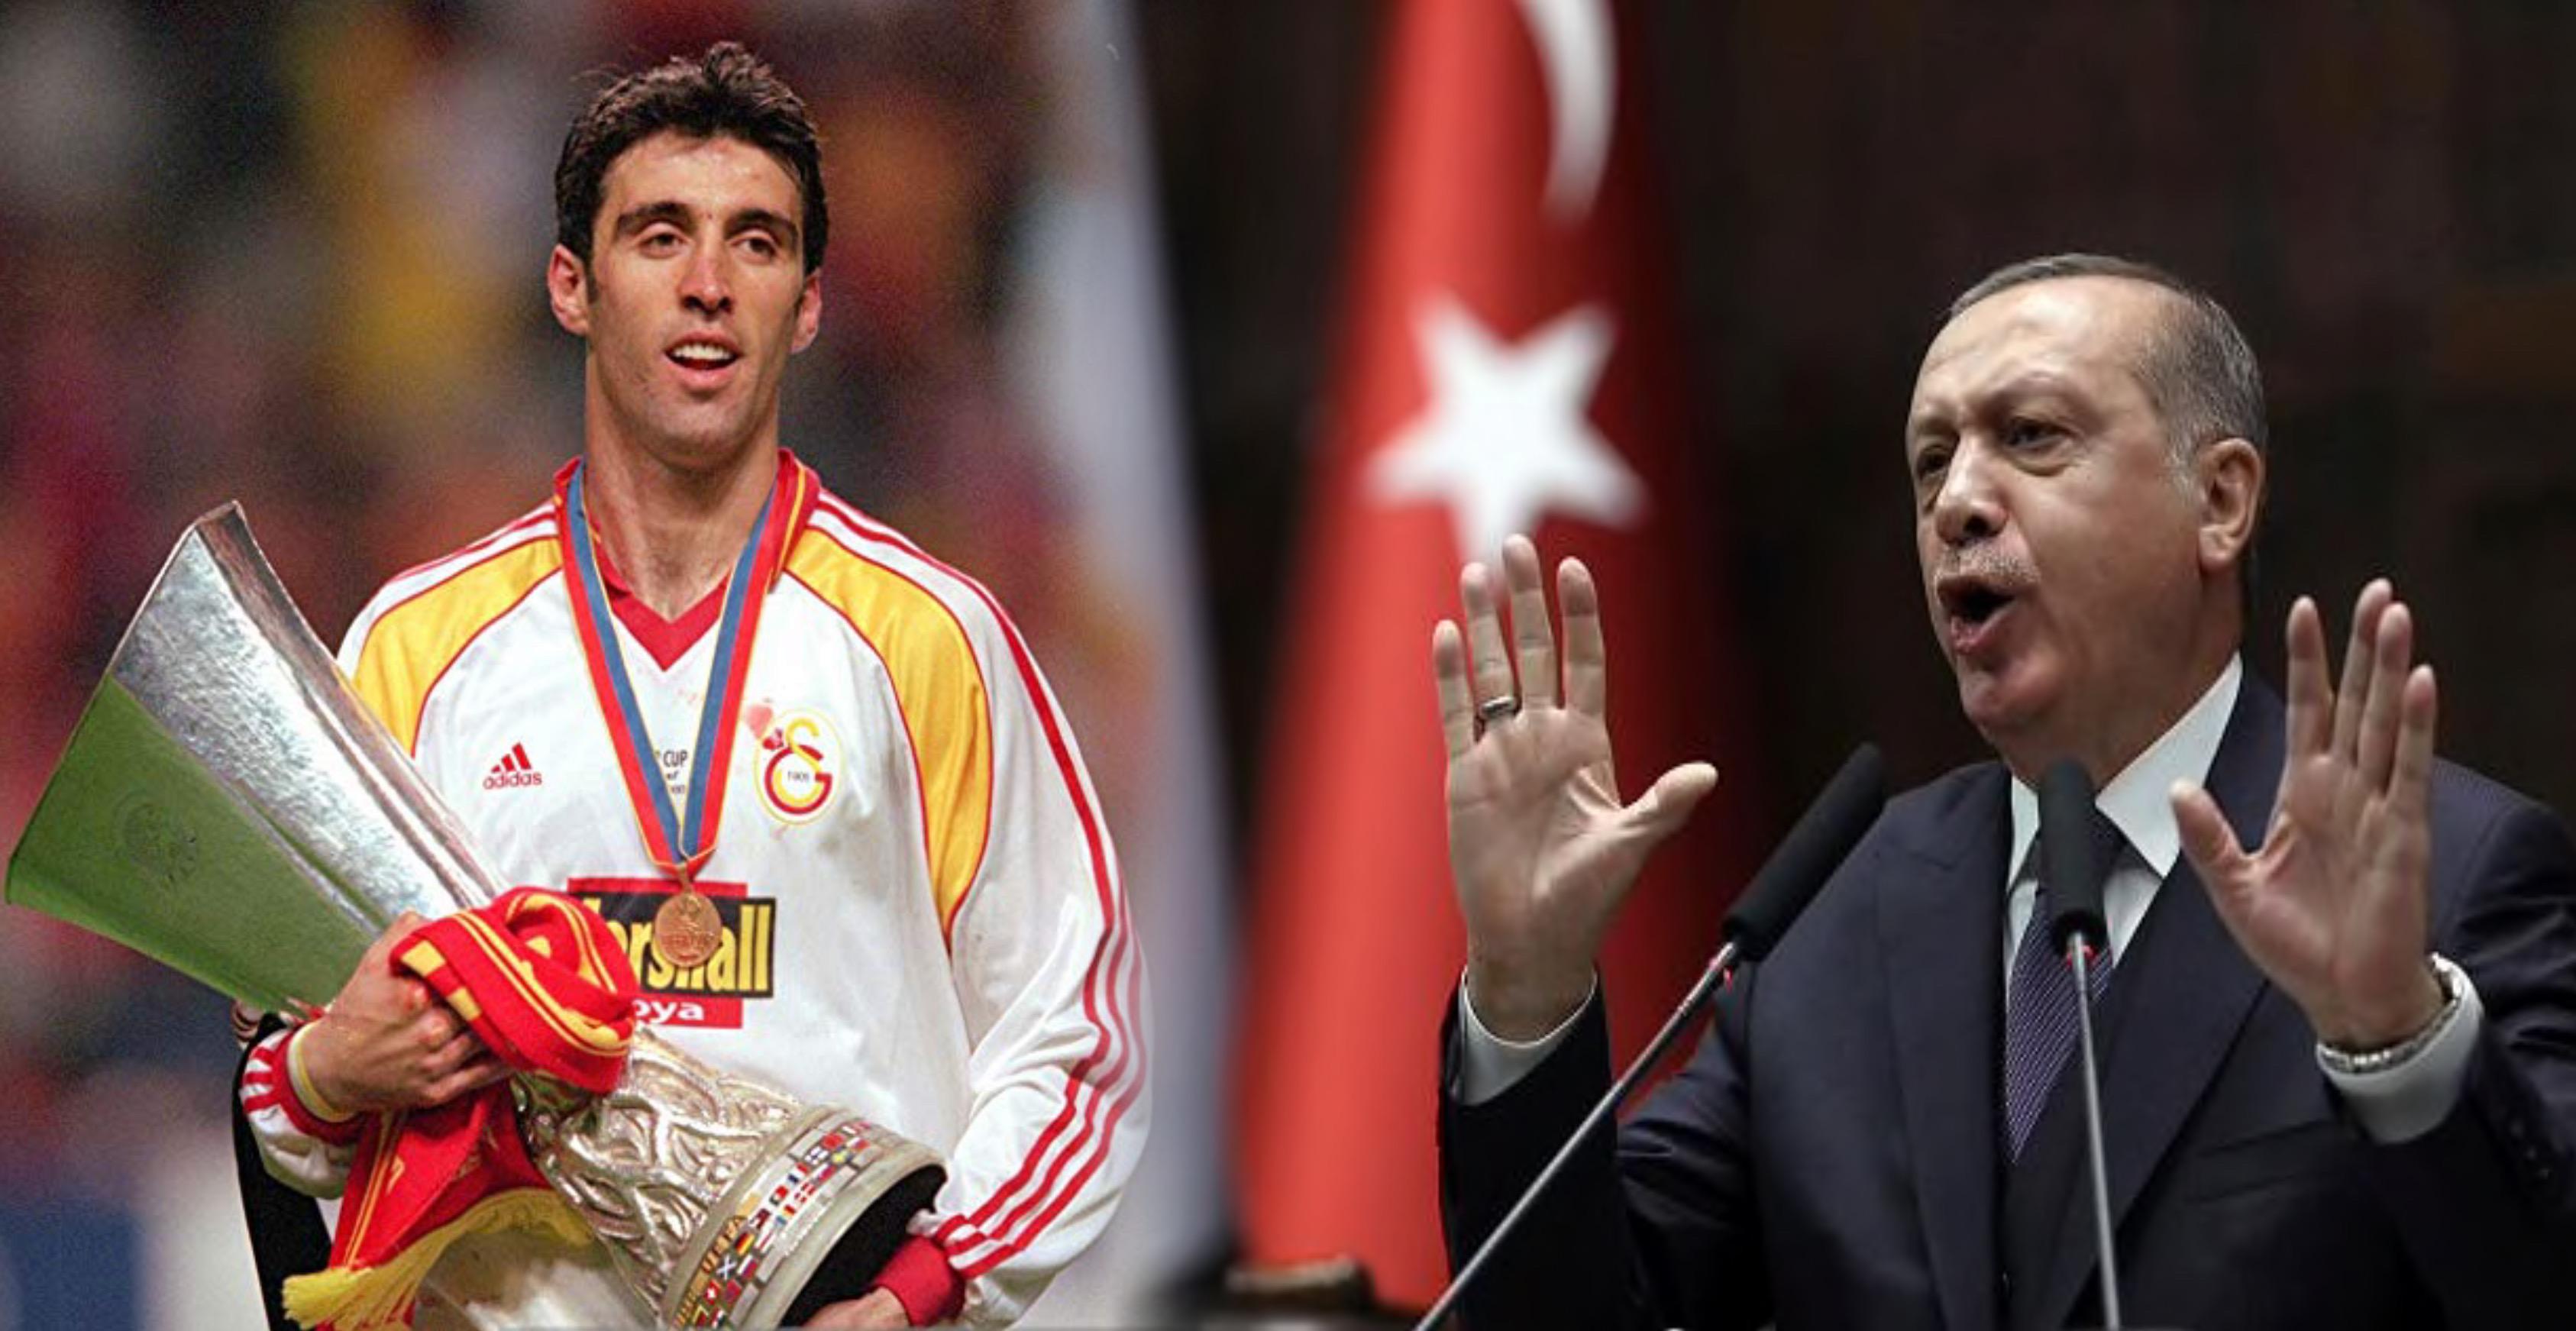 Photo of من نجم دولي لكرة في تركيا الى لاجئ وسائق تكسي لانه انتقد أردوغان وحزبه